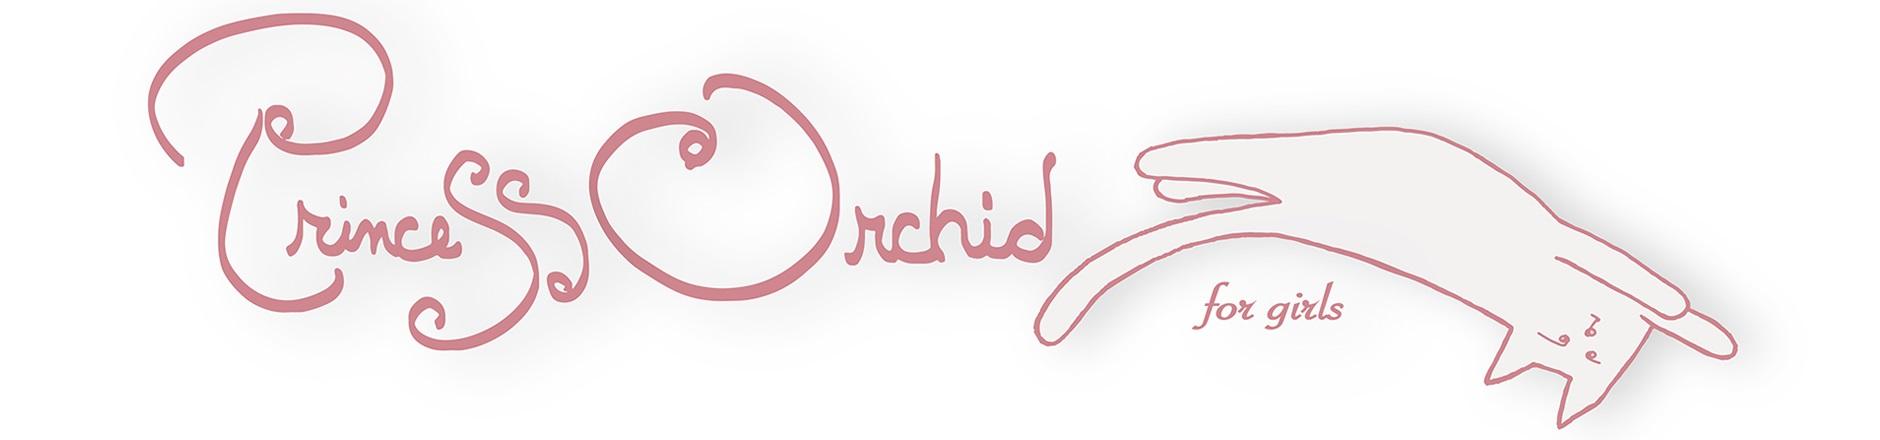 Princess Orchid Logo